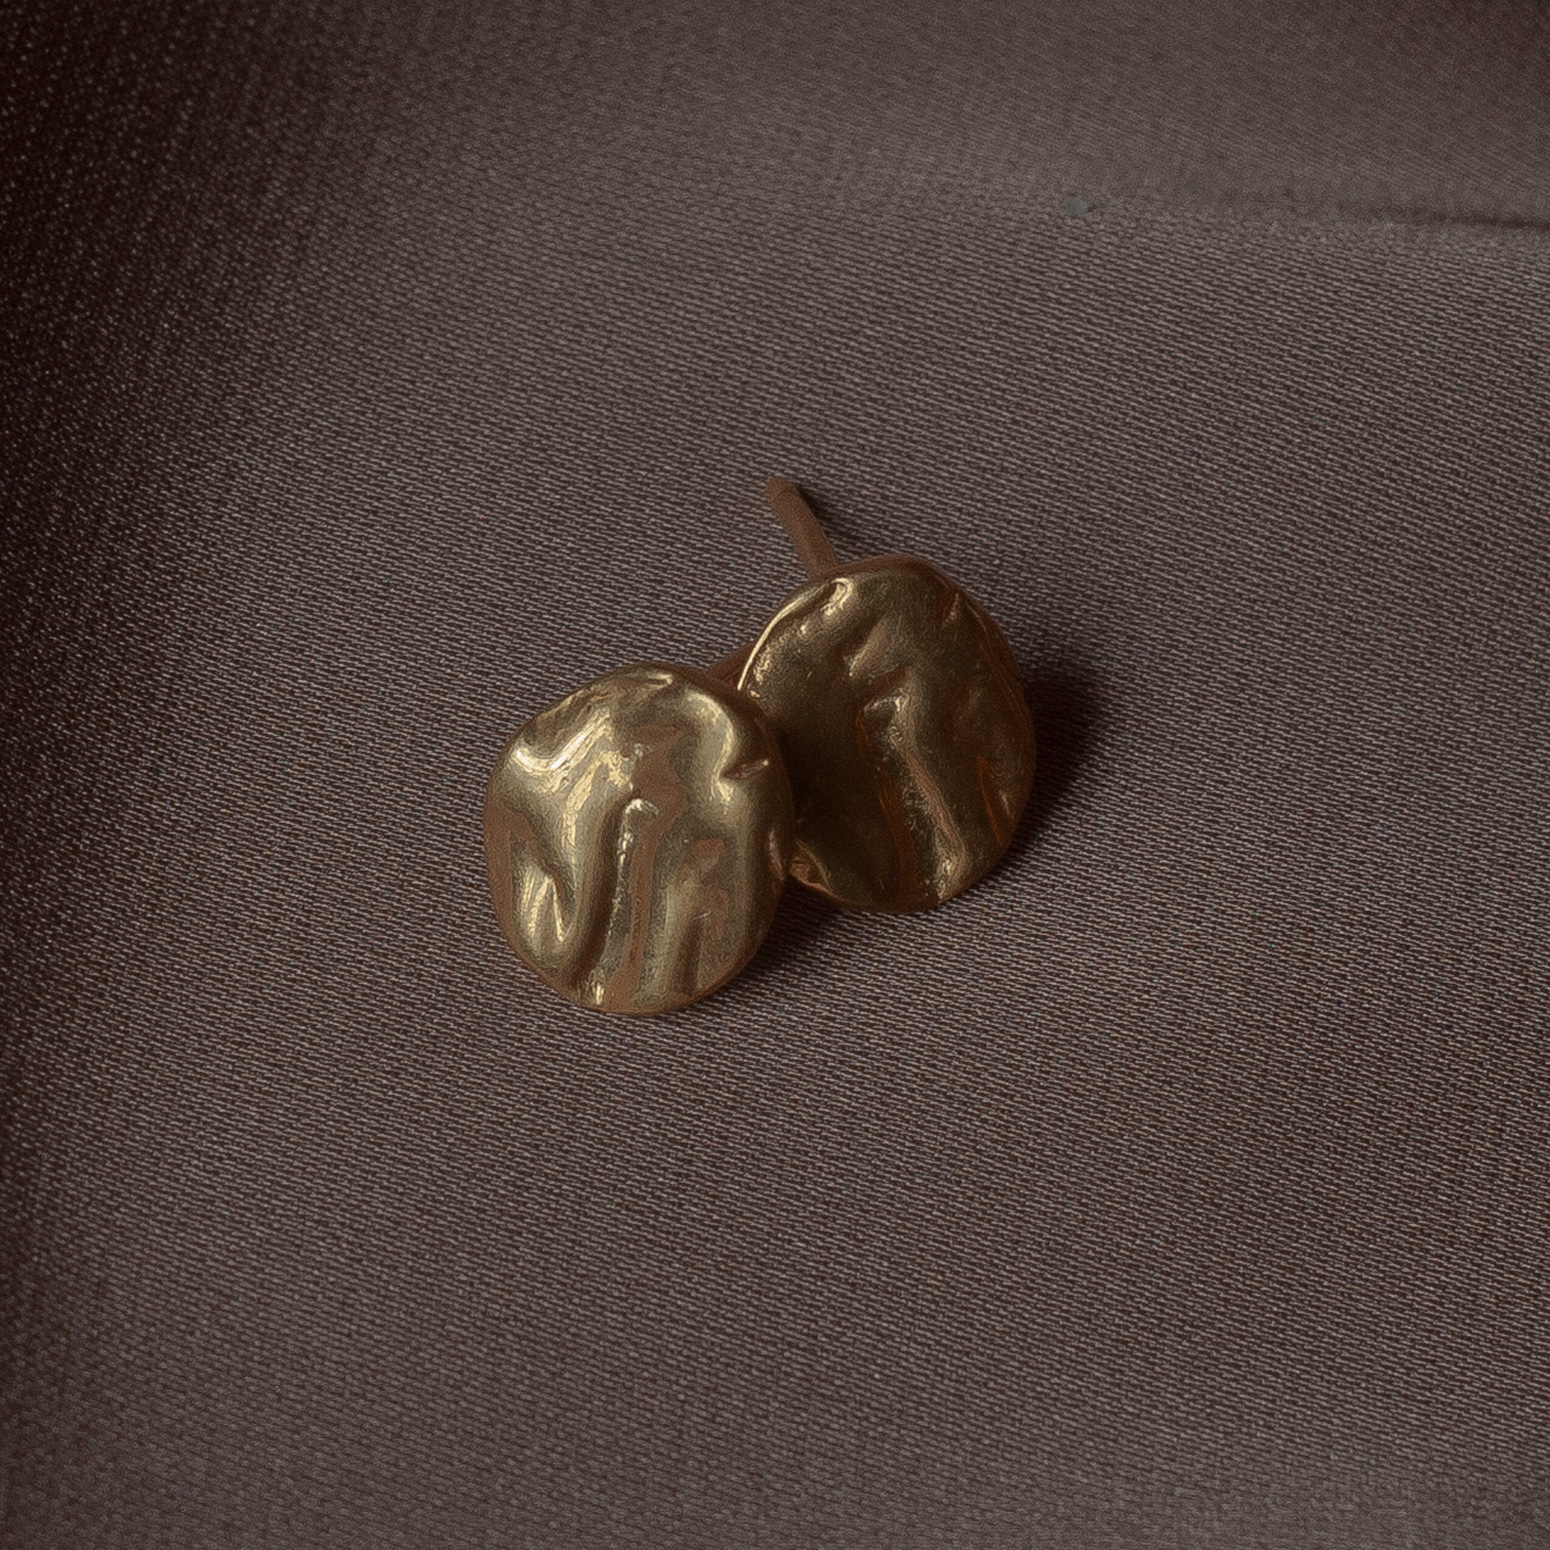 zolotye-sergi-gvozdiki-r02-gold